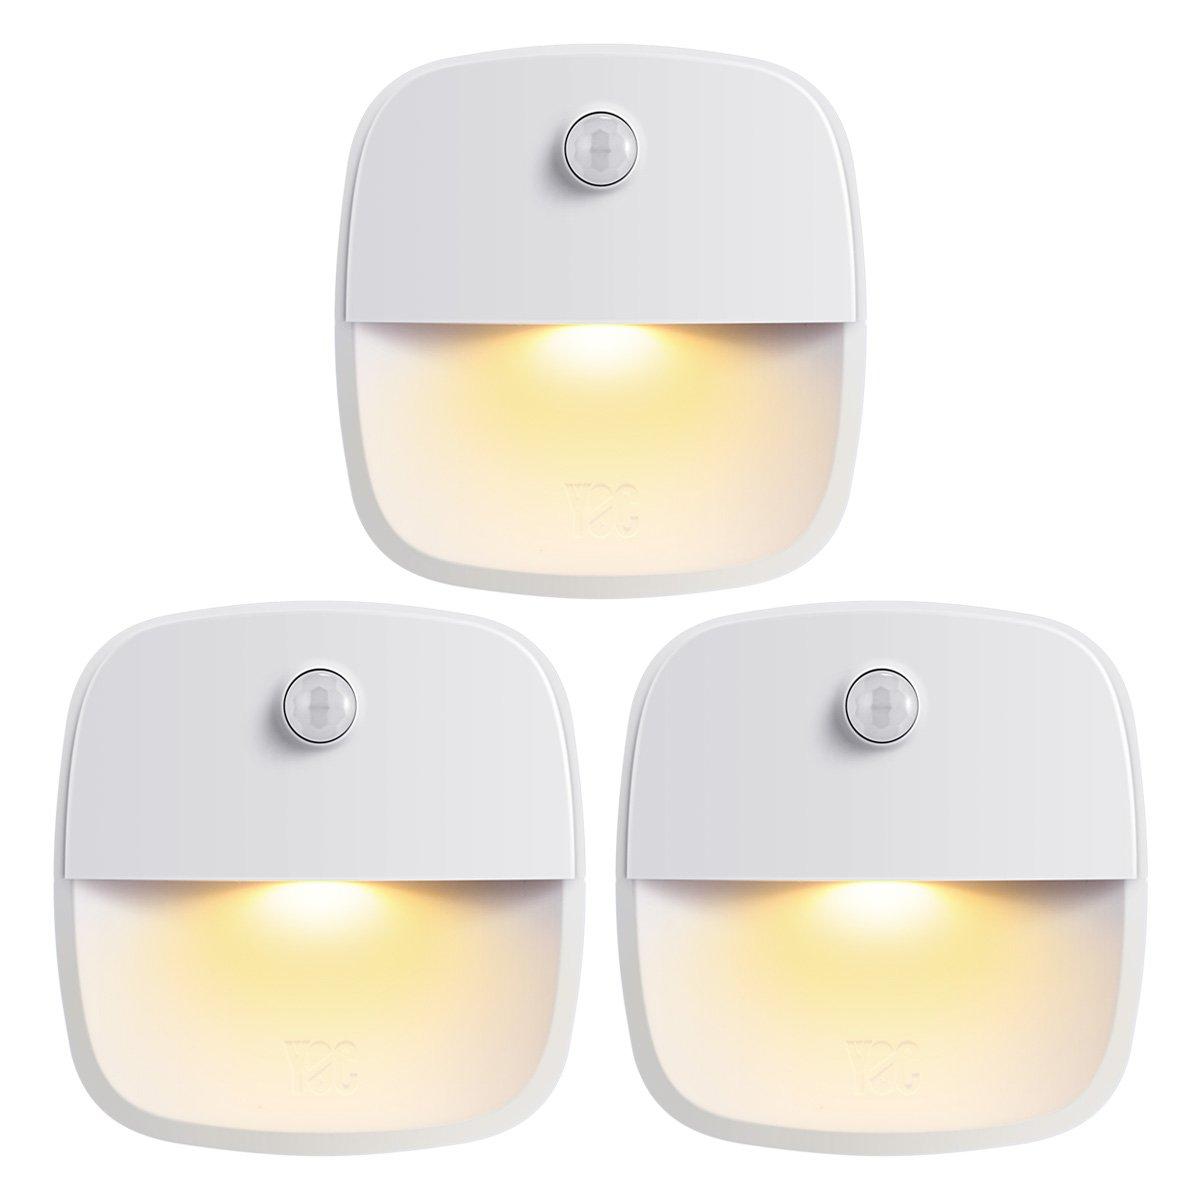 AMIR Motion Sensing Light, Stick-on Anywhere Battery-Powered LED Night Light, Stair Lights, Safe Light for Bathroom, Hallway, Bedroom, Kitchen (Warm White, 3-Pack)